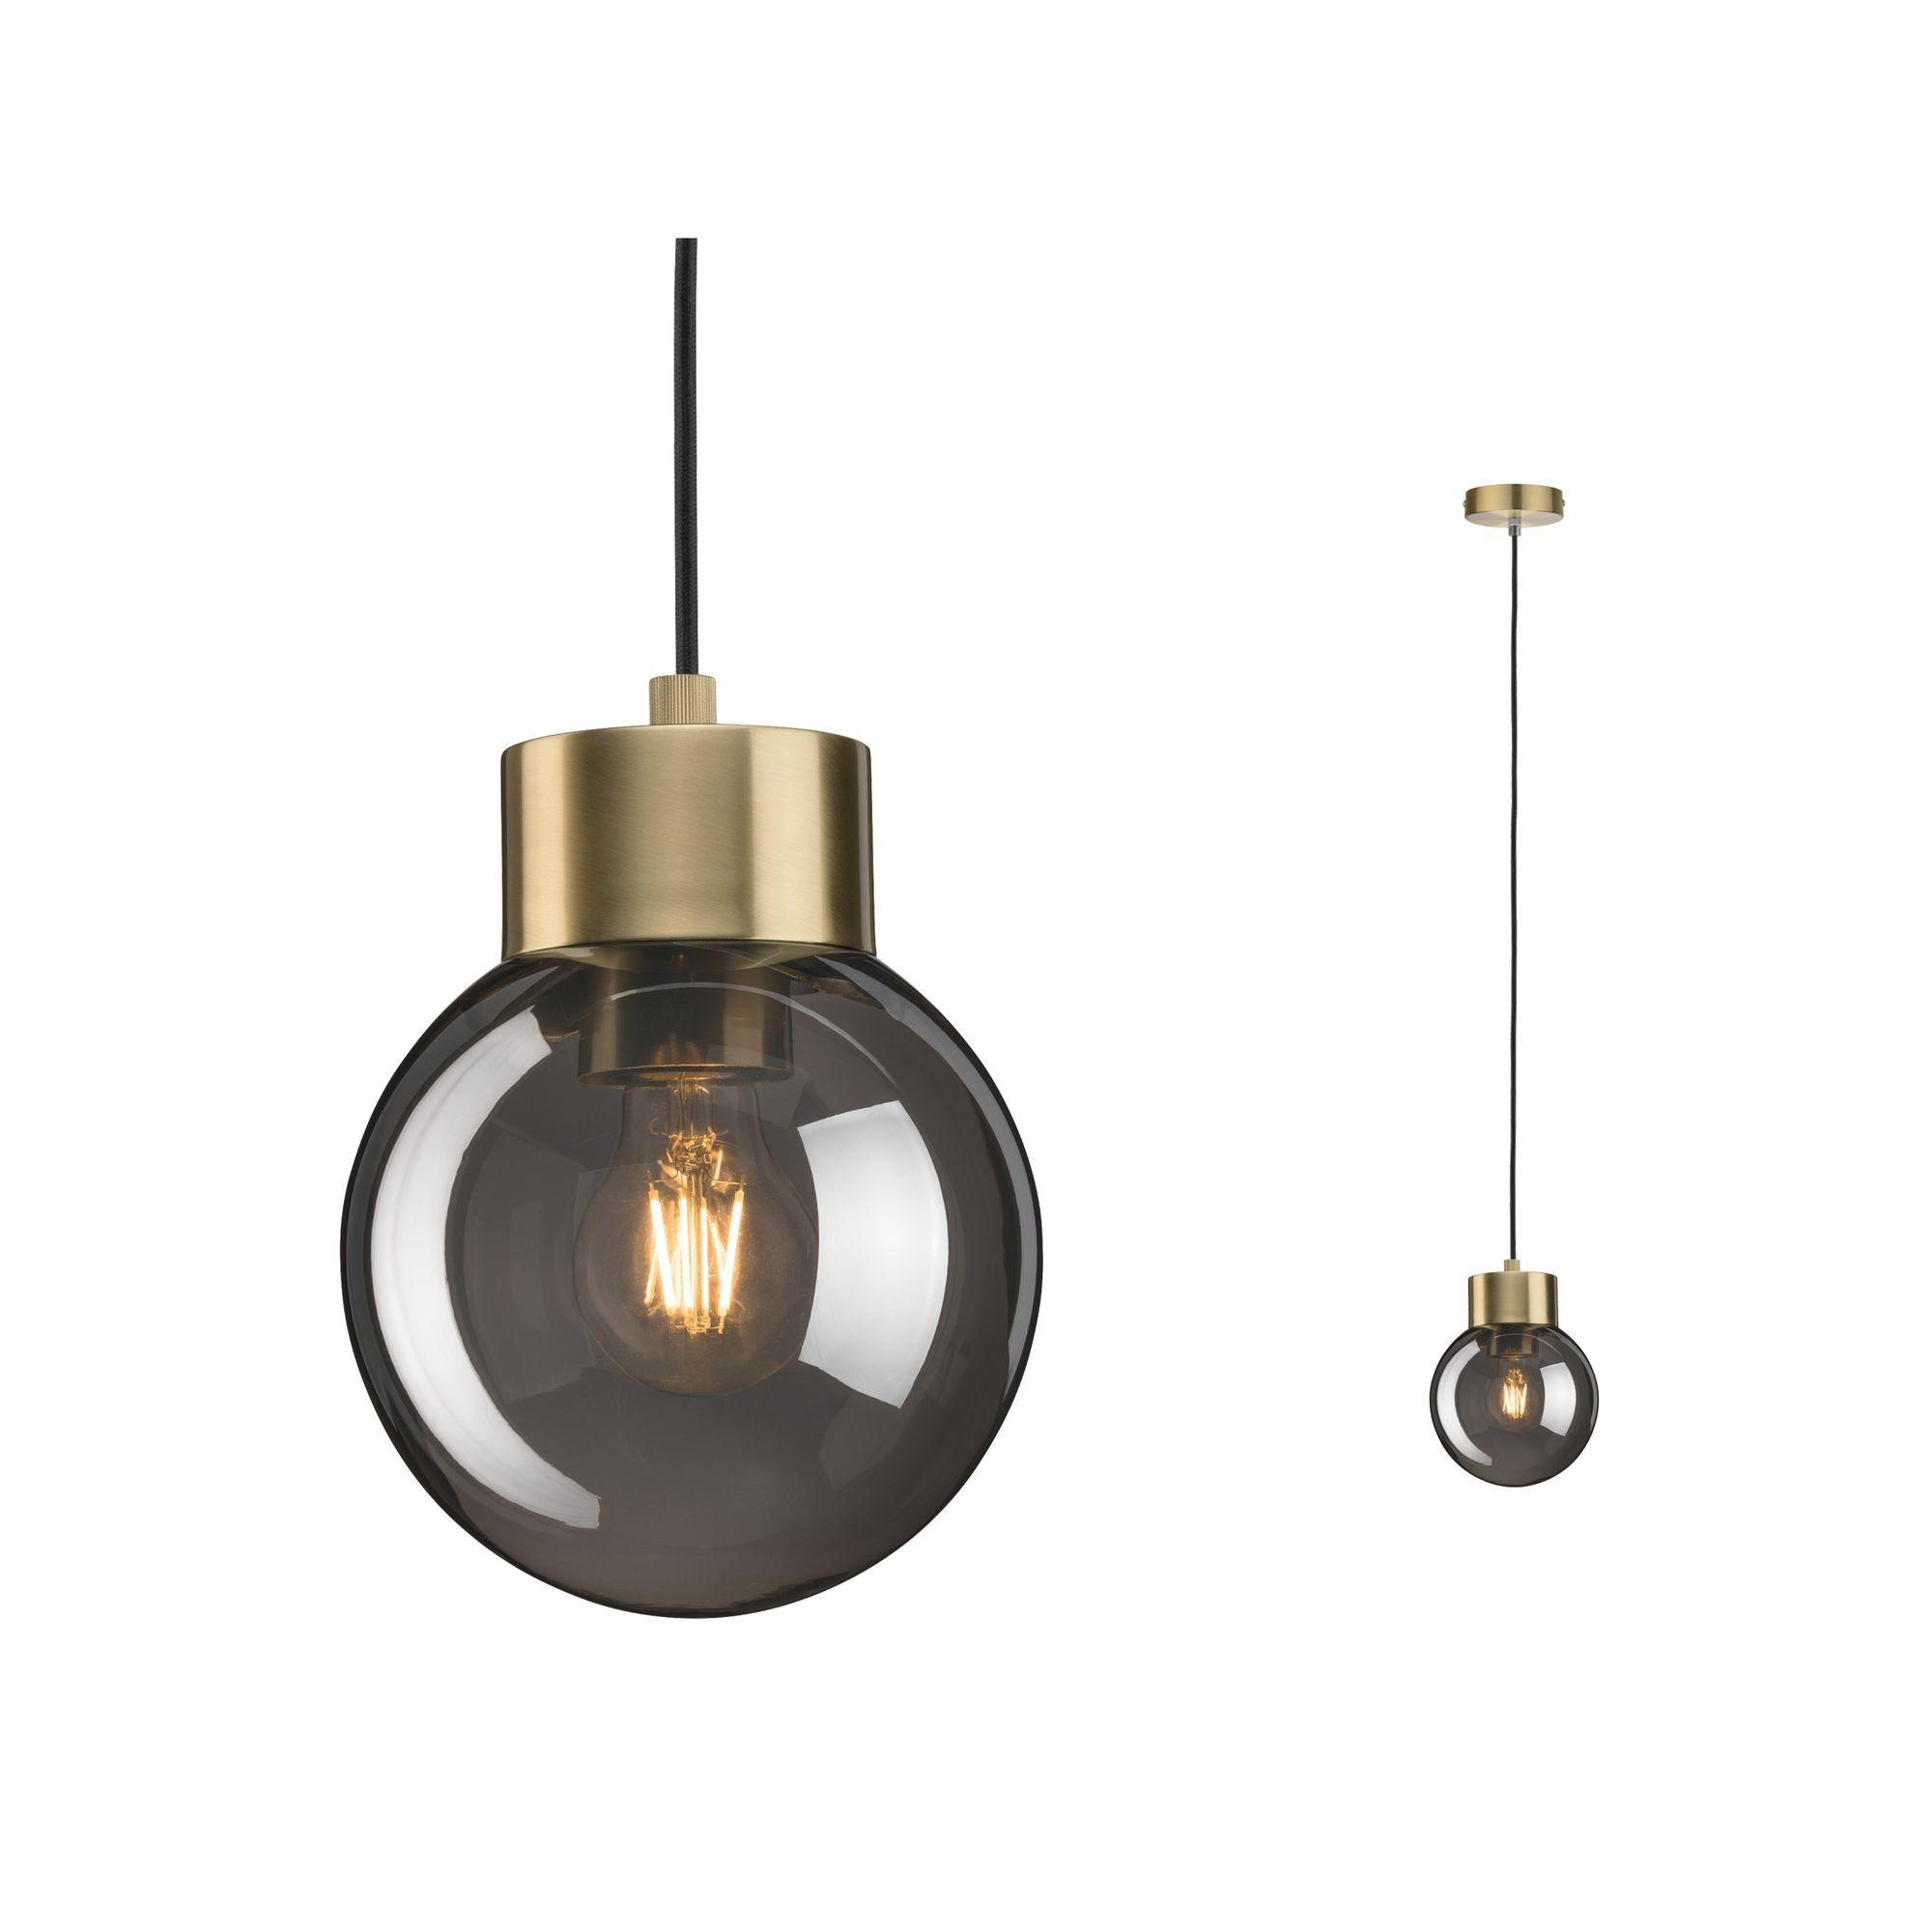 Paulmann LED Pendelleuchte Linja Rauchglas verspiegelt/Messing max. 20W E27, E27, 1 St.